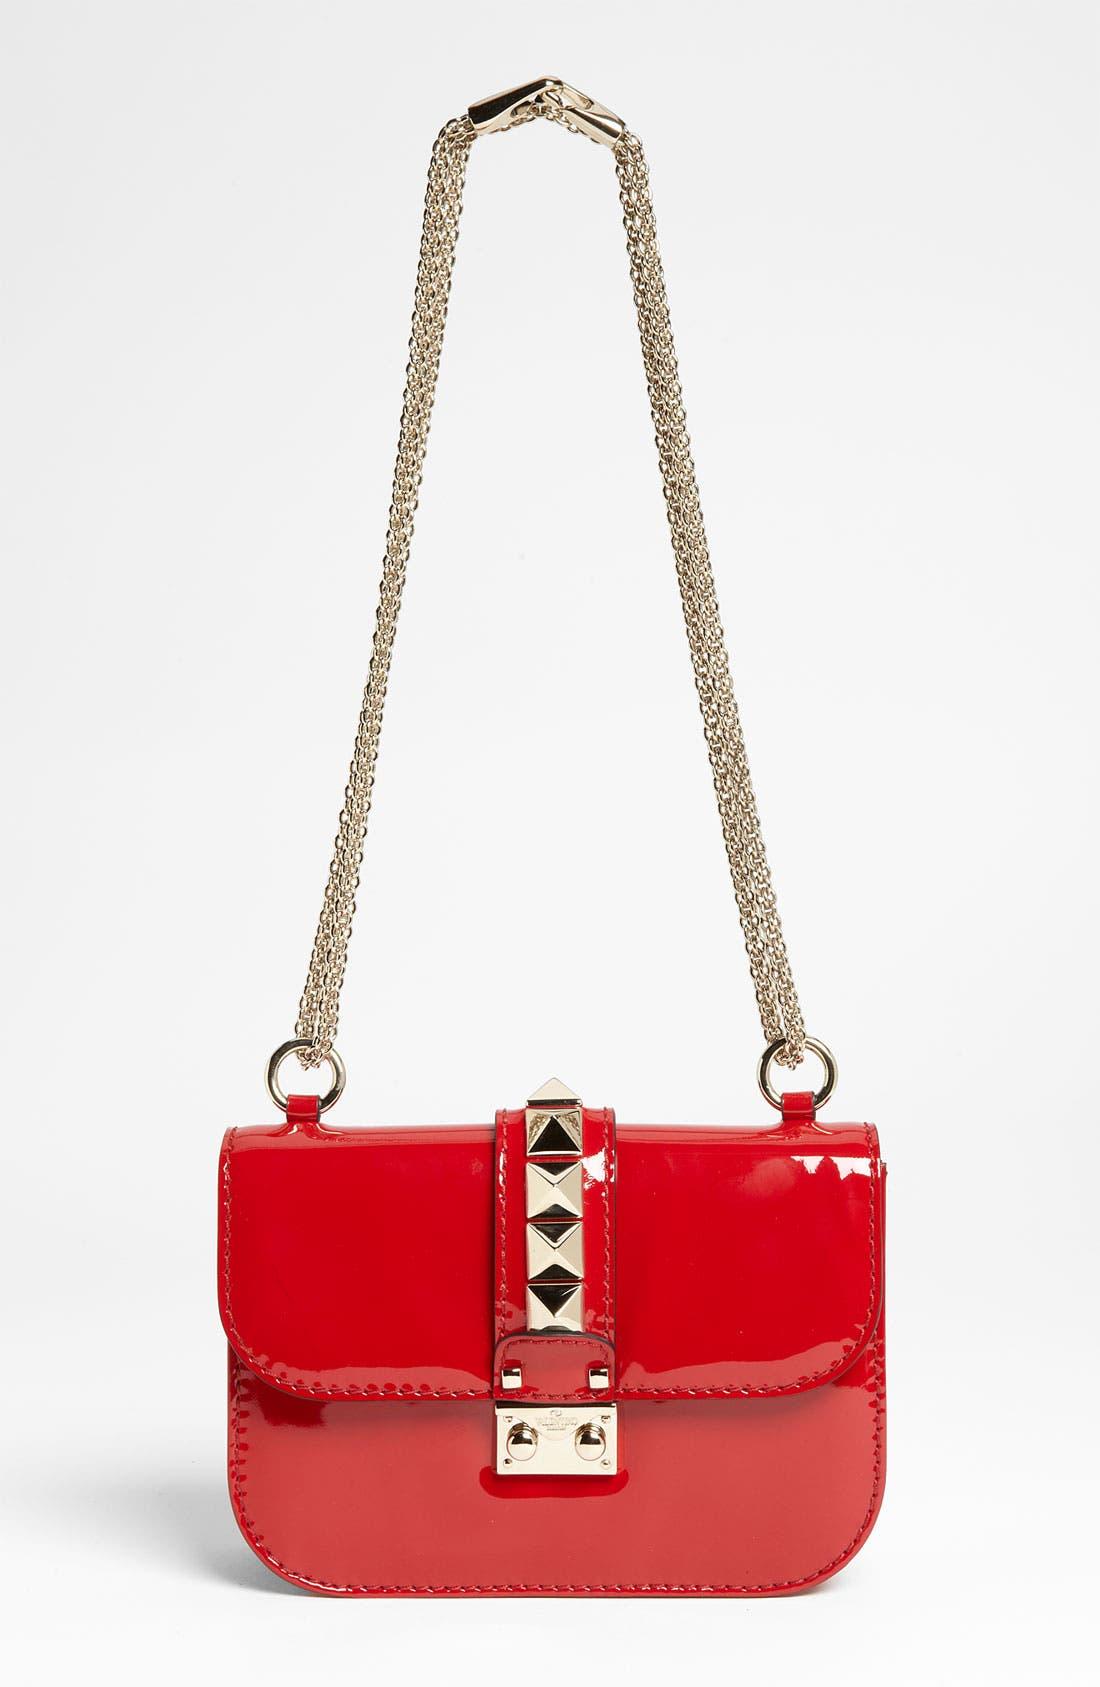 Alternate Image 1 Selected - Valentino 'Rockstud - Small Lock' Leather Shoulder Bag